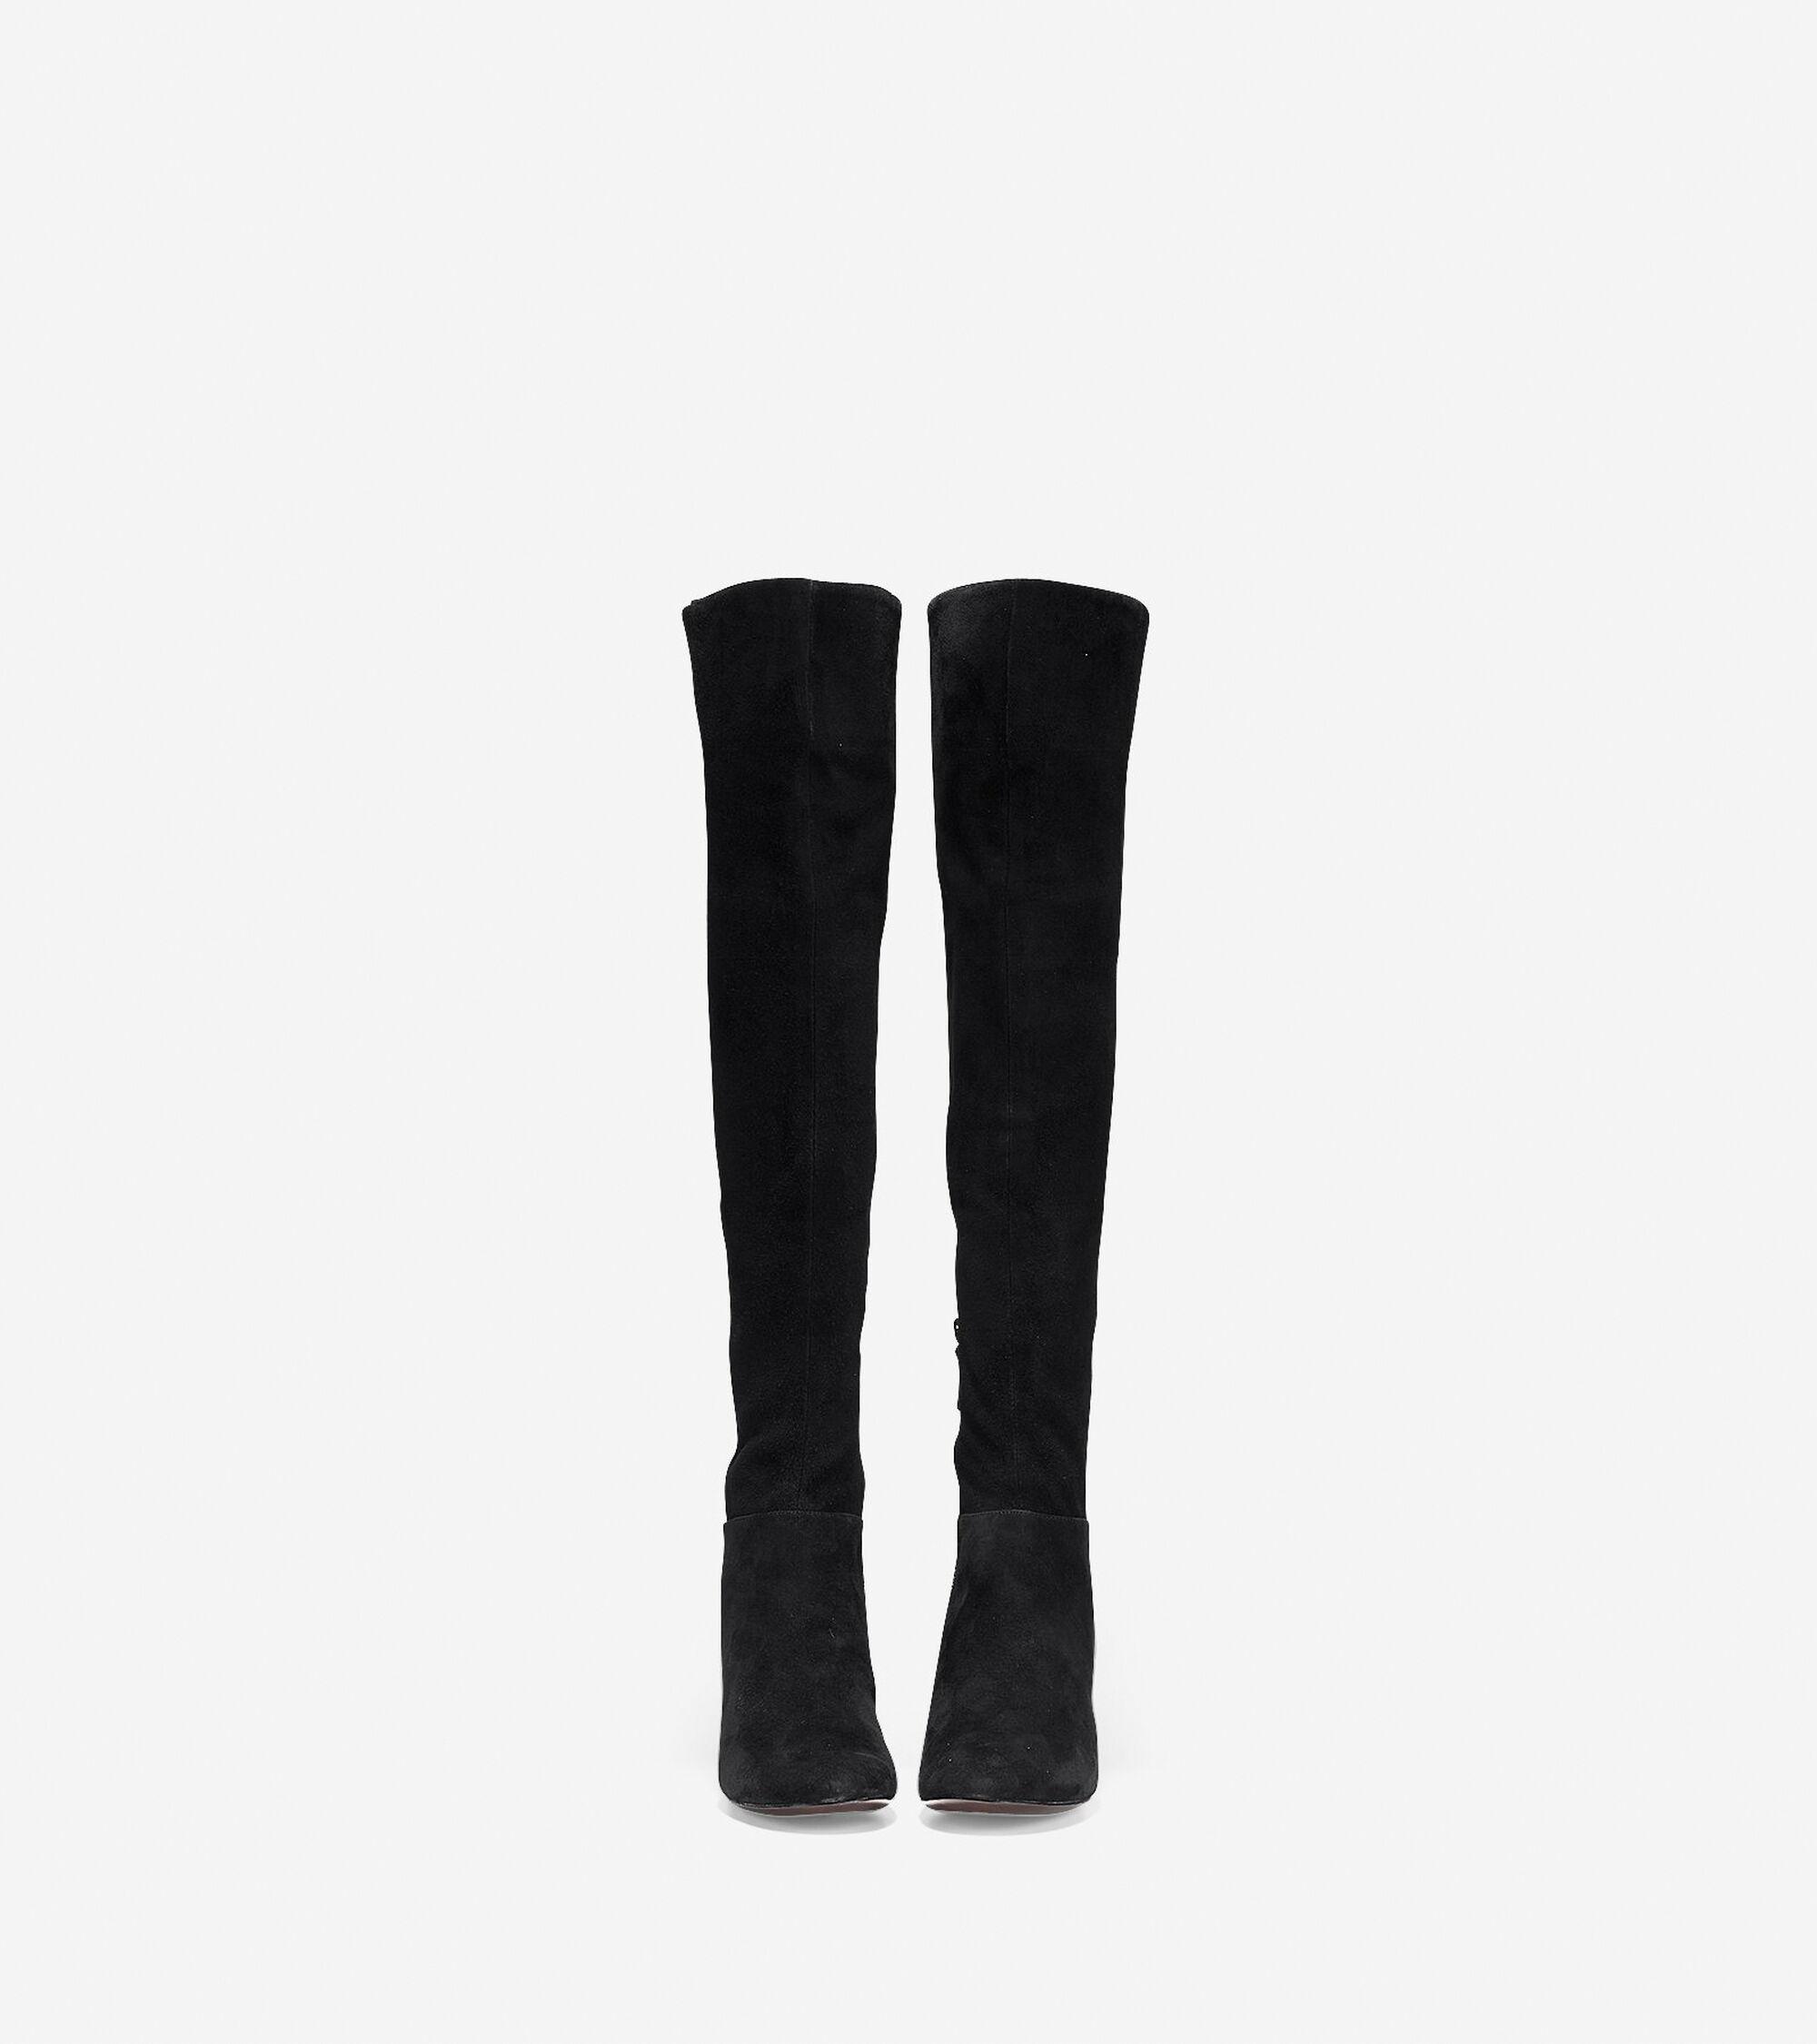 3e532fadfbc Women s Elnora Over The Knee Boots 60mm in Black